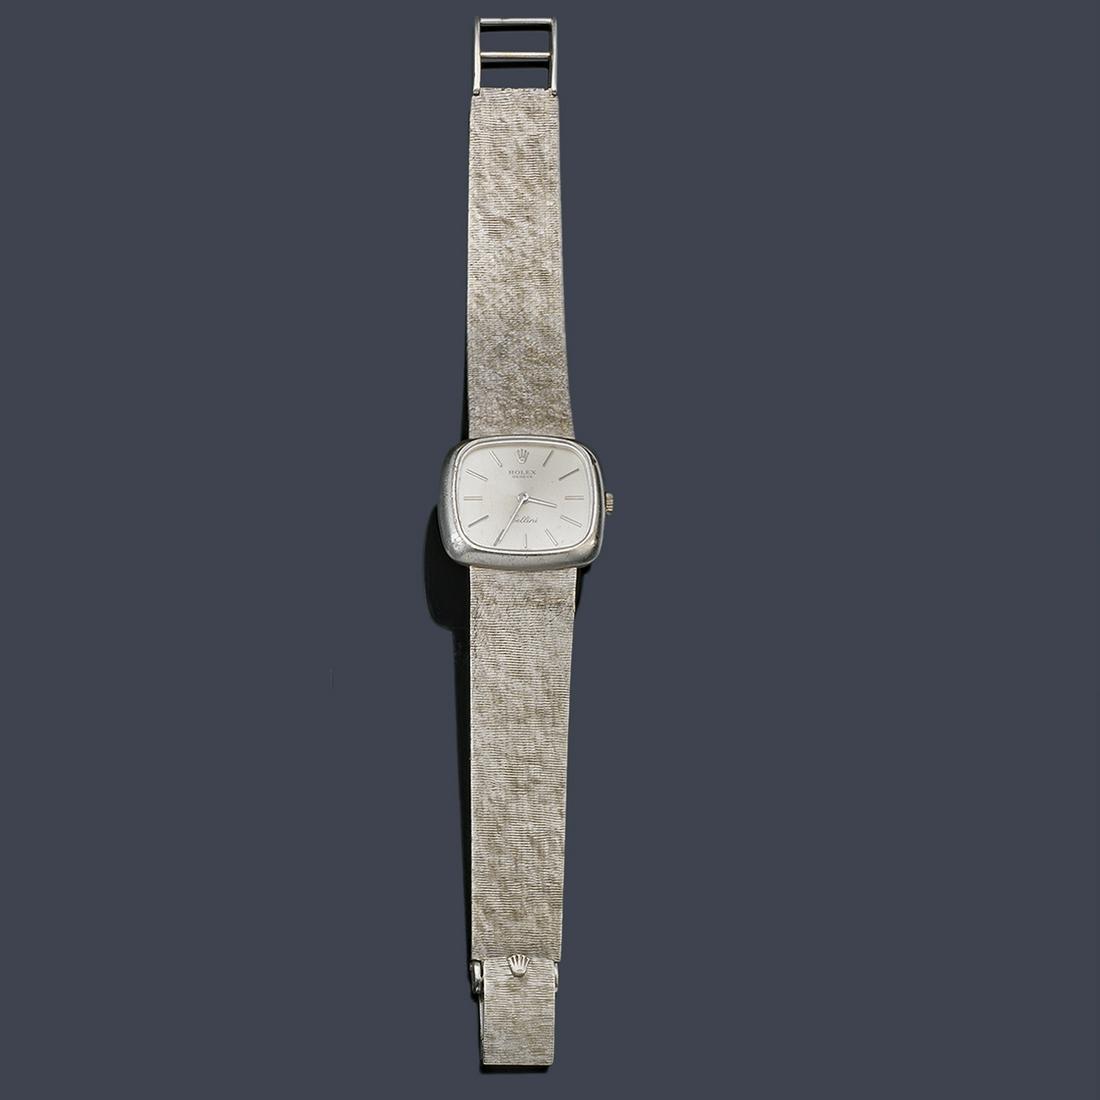 ROLEX Cellini nº 2097795 ladies' timepiece with case